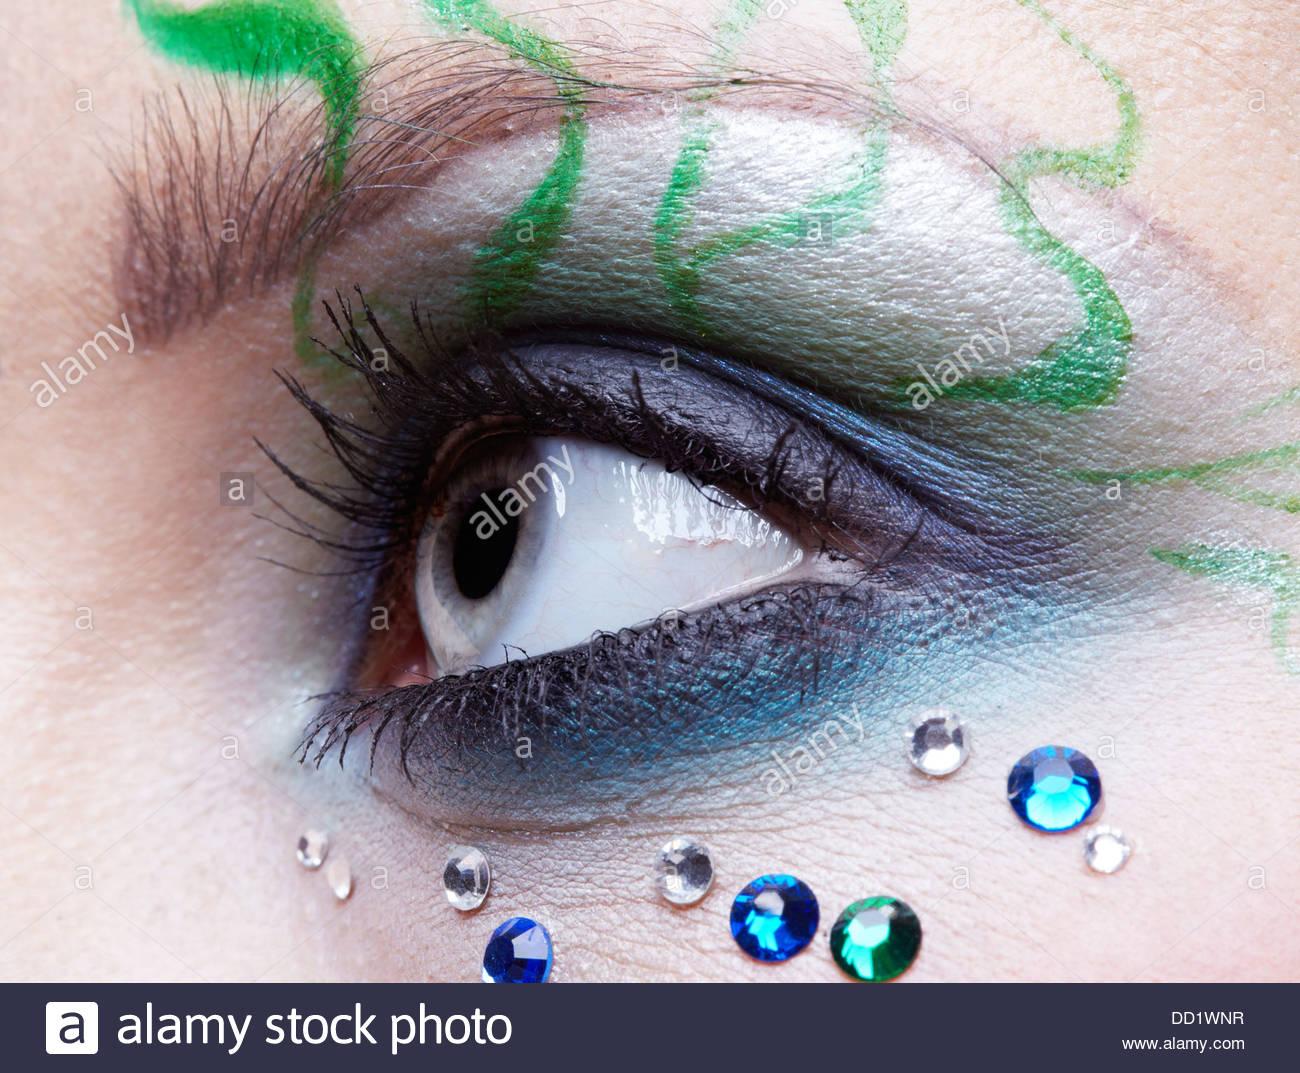 girl's eye zone bodyart - Stock Image